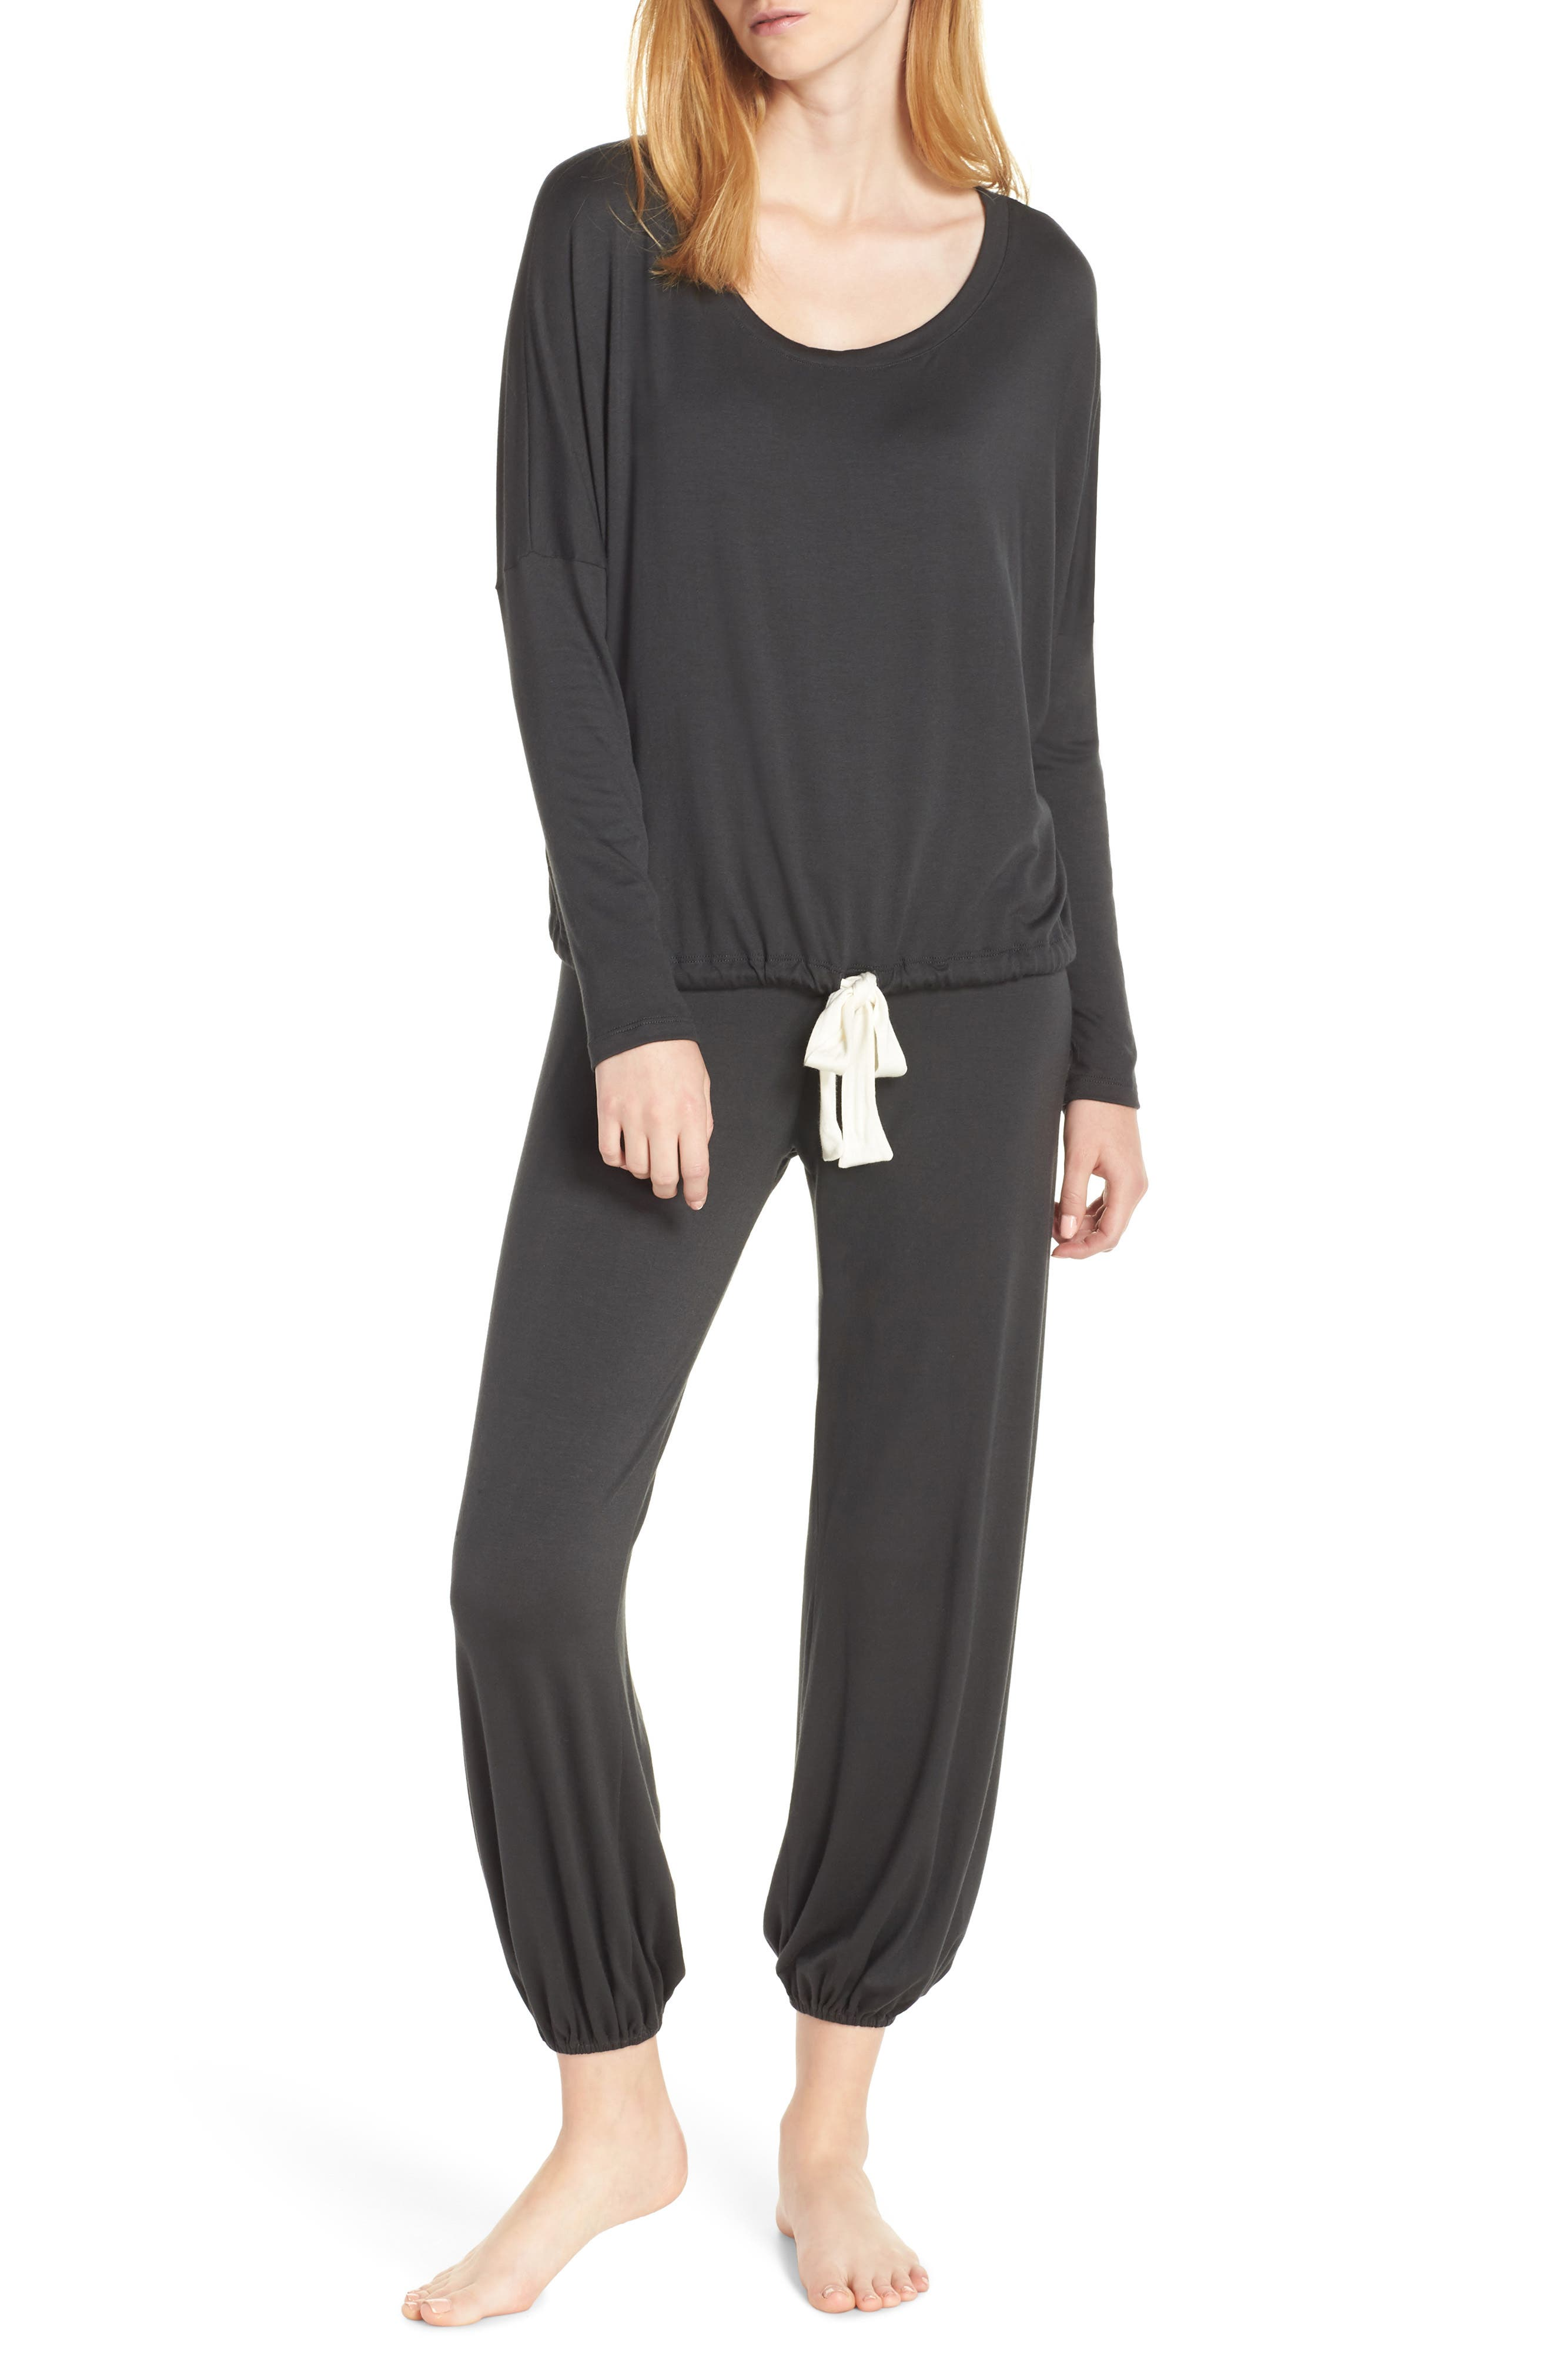 Heather Slouchy Pajamas,                             Main thumbnail 1, color,                             077